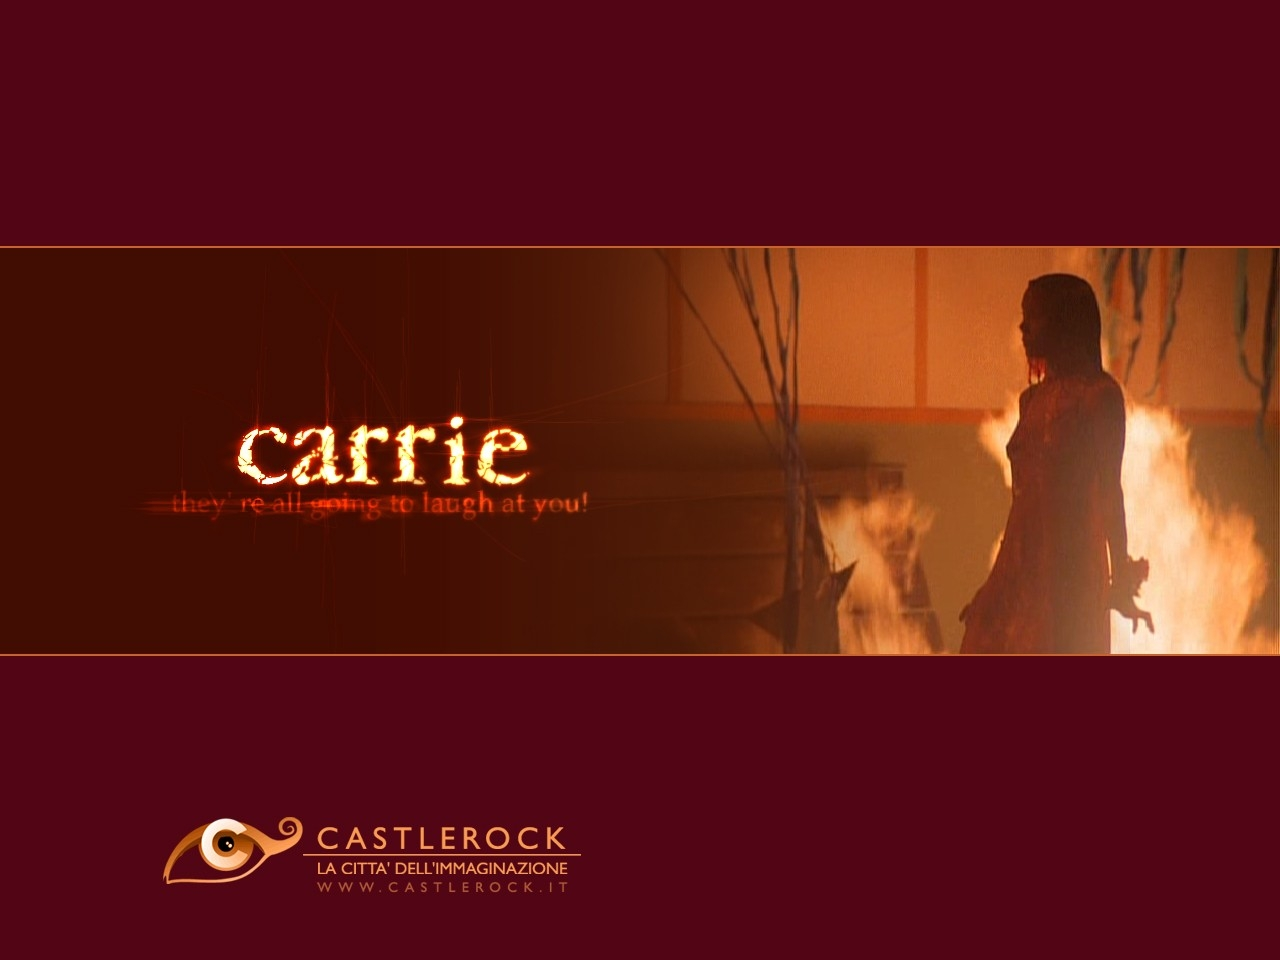 Wallpaper del film Carrie - Lo sguardo di Satana